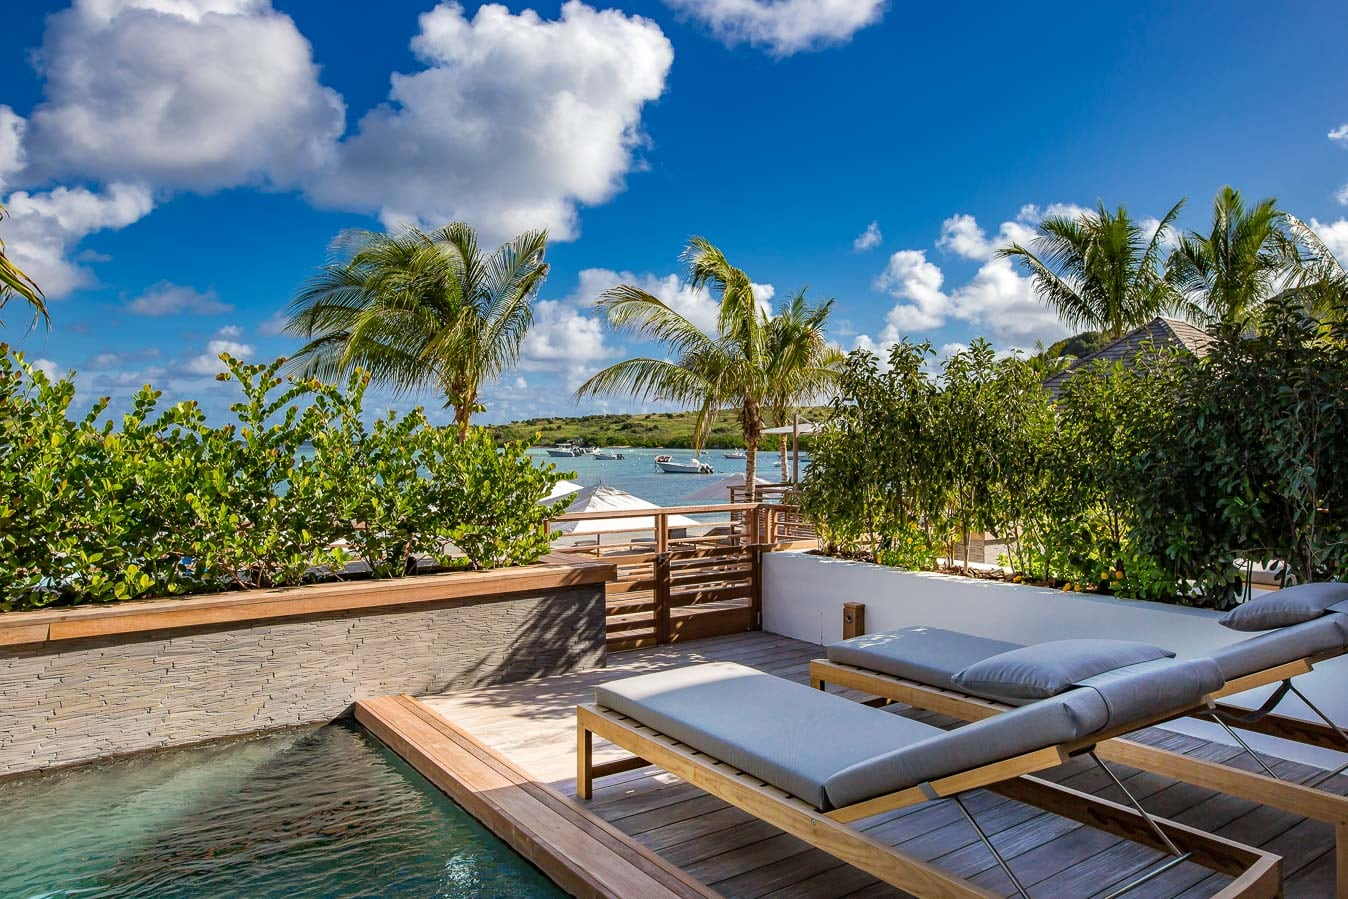 Le Barthelemy Hotel Spa Ocean Lux Piscine Privee4 Larentbenoit